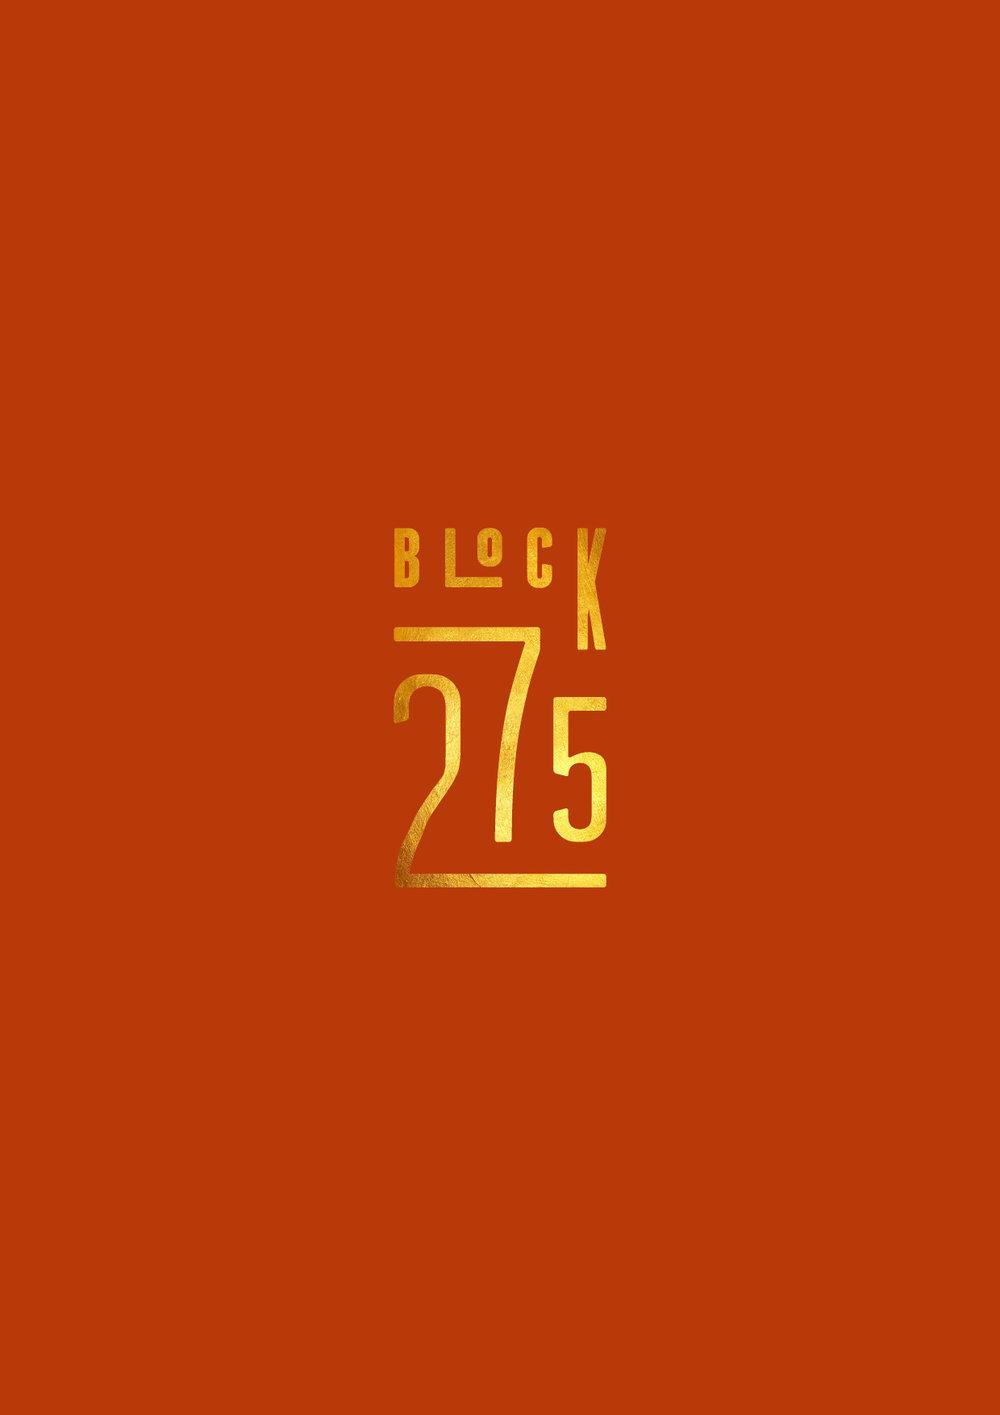 Block 275_Logo Concept 2 - 3.jpg